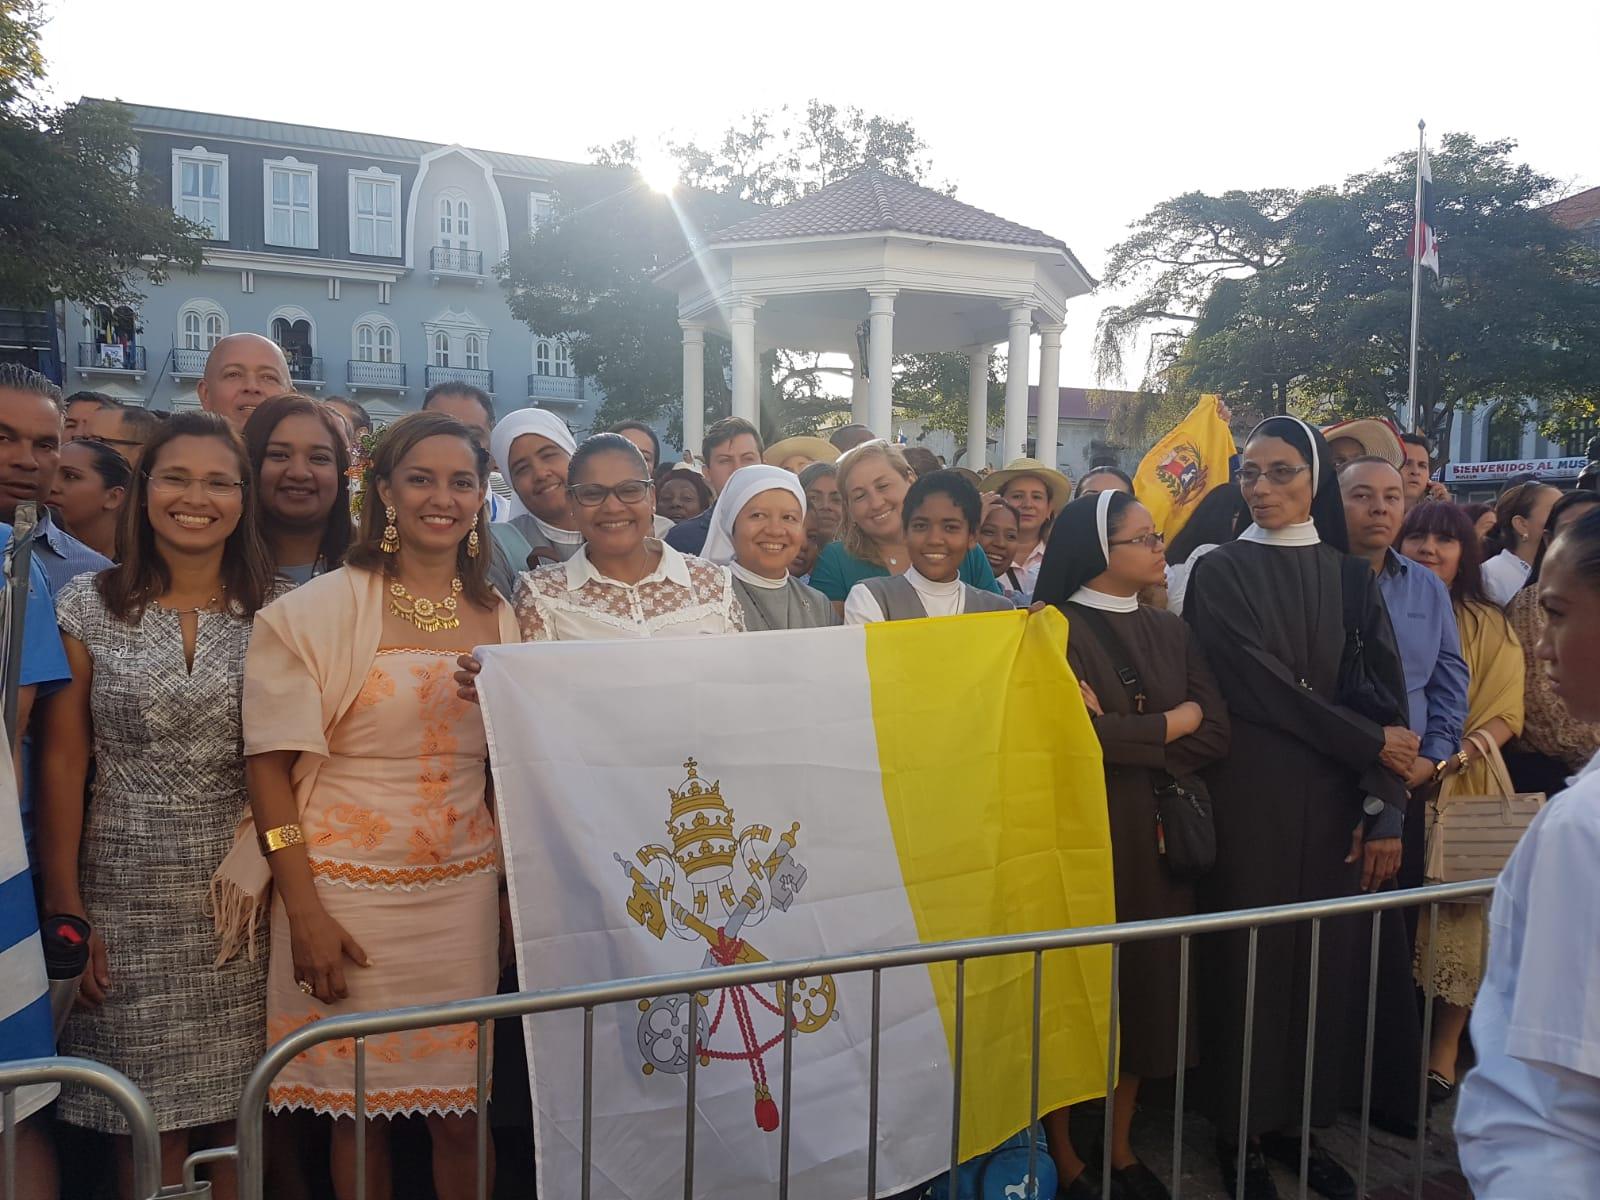 Pope S Homily At Cathedral Of Santa Maria La Antigua In Panama Full